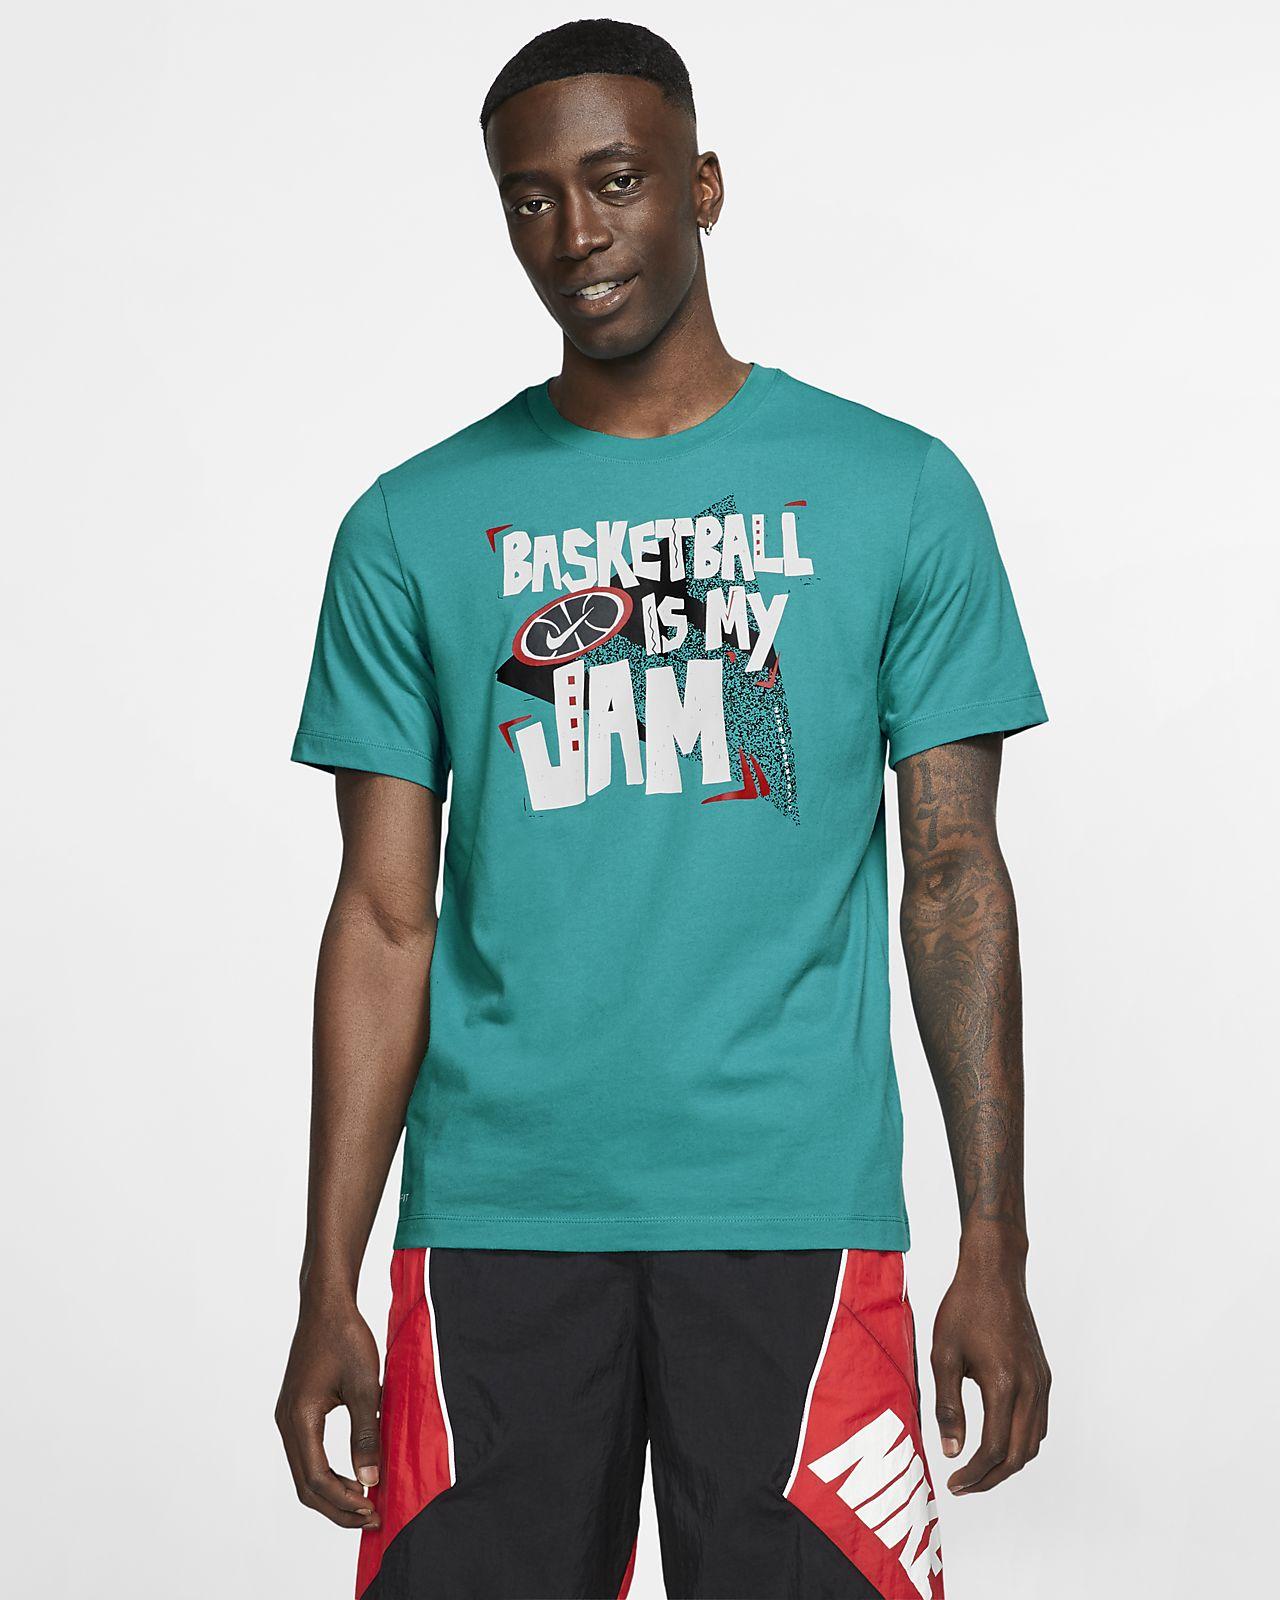 Nike Mpsvquz Jam Men's Shirtid T Fit Basketball Dri xdrthQCBs